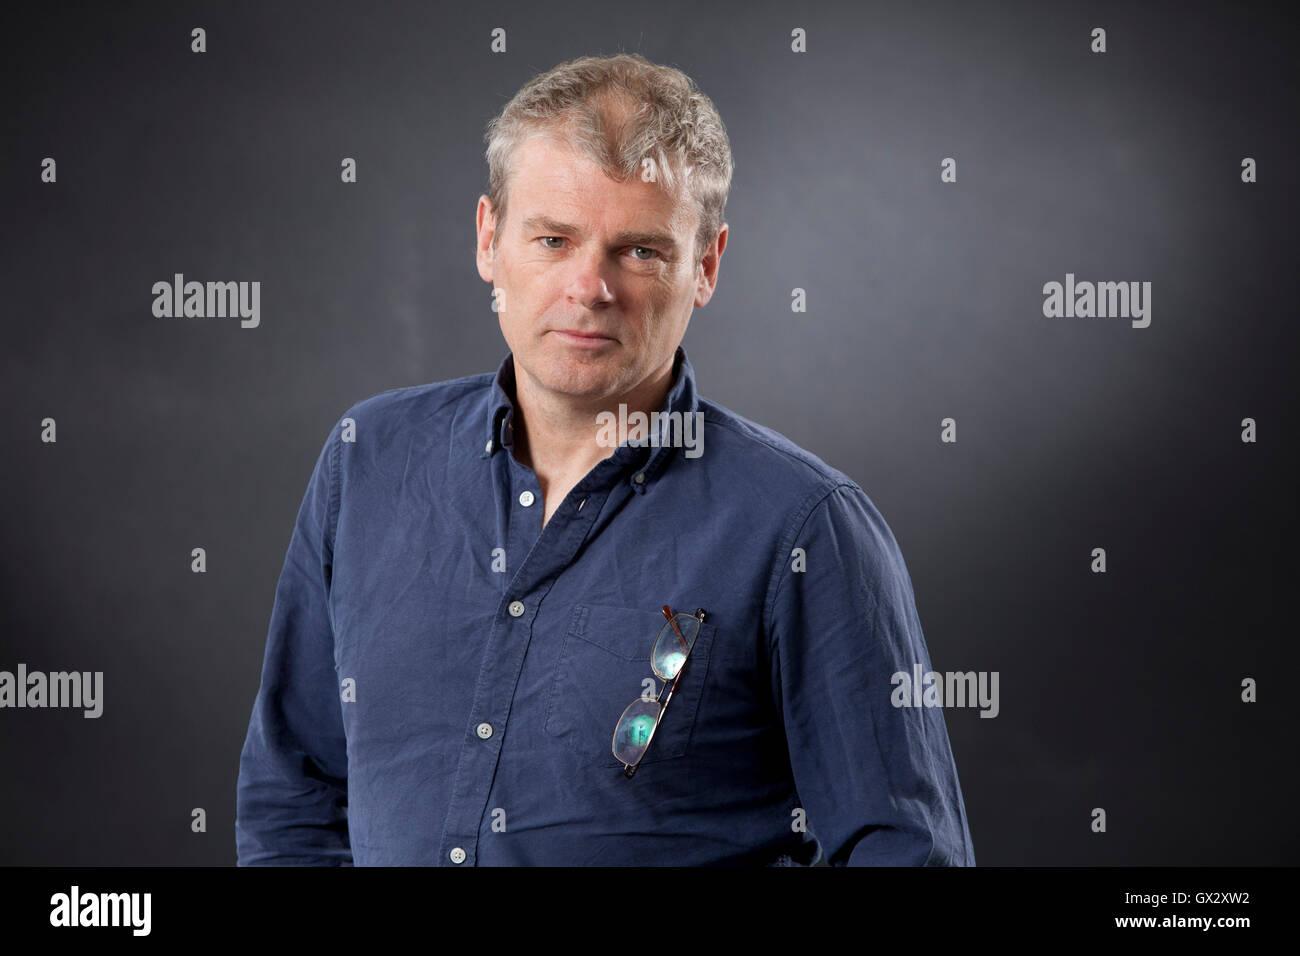 Mark Haddon, the English novelist, at the Edinburgh International Book Festival. Edinburgh, Scotland. 23rd August - Stock Image